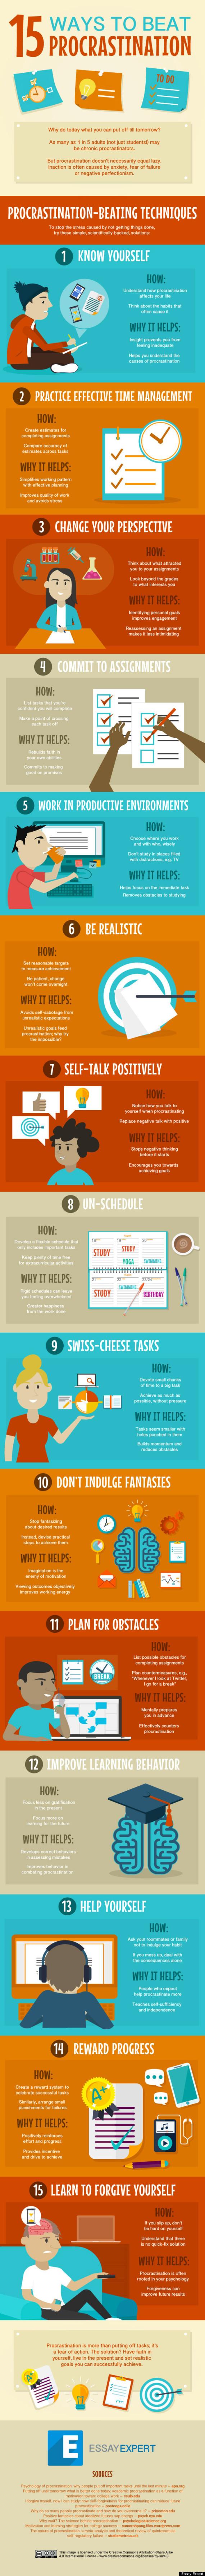 procrastination tips